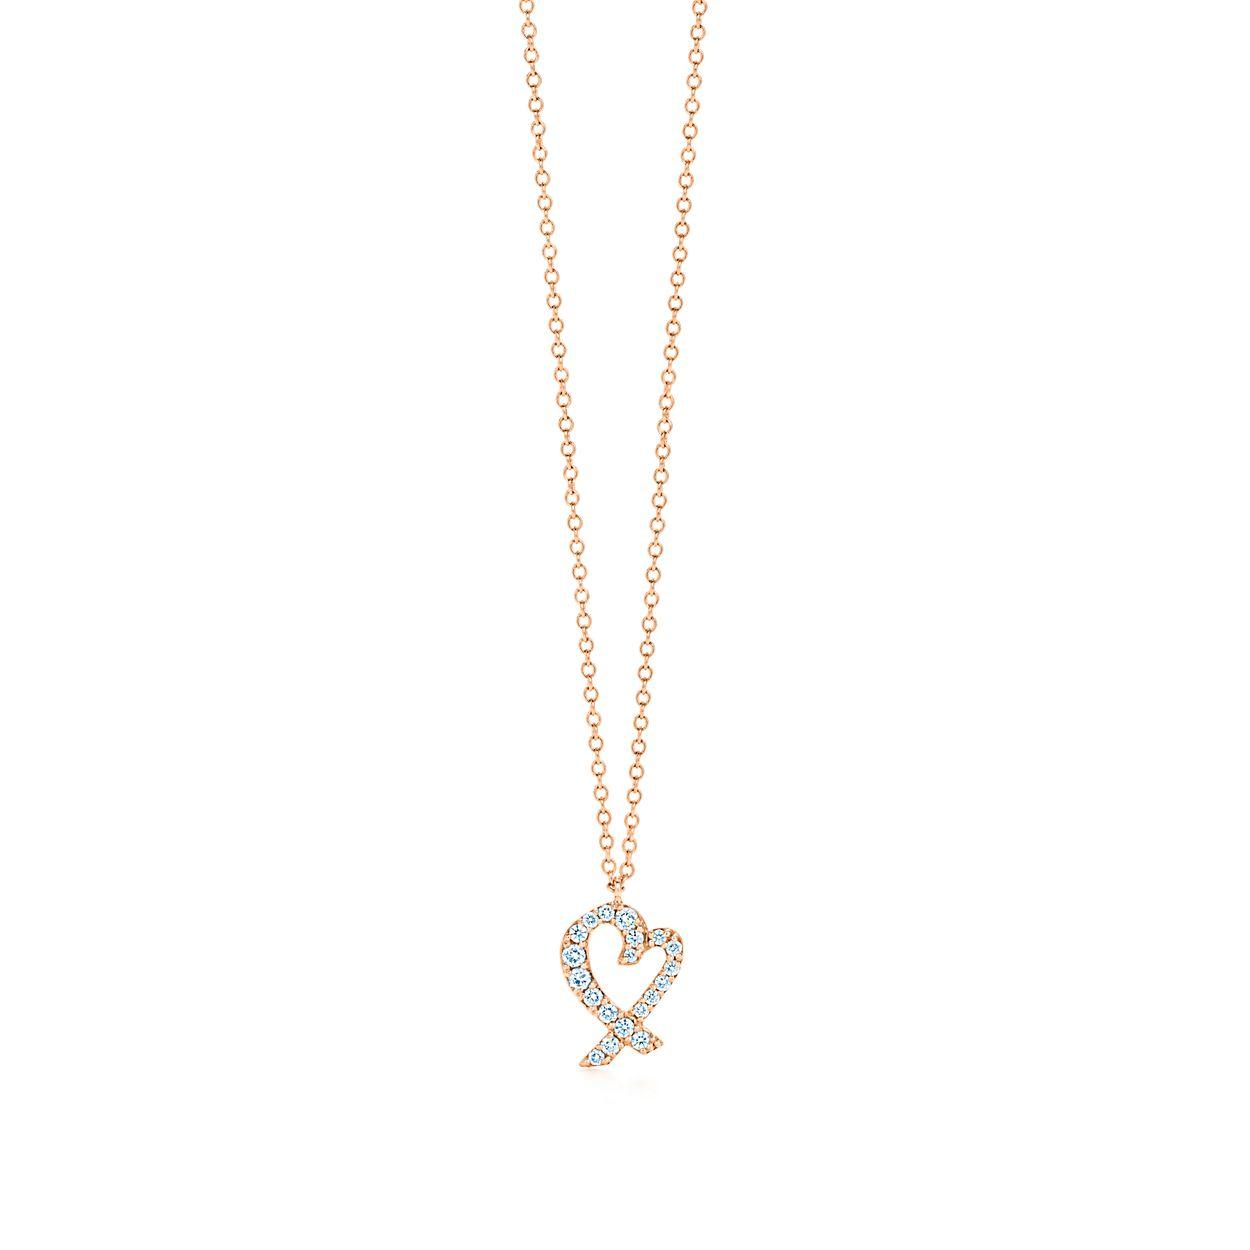 Paloma picasso loving heart pendant in 18k rose gold with diamonds paloma picassoloving heart pendant aloadofball Gallery